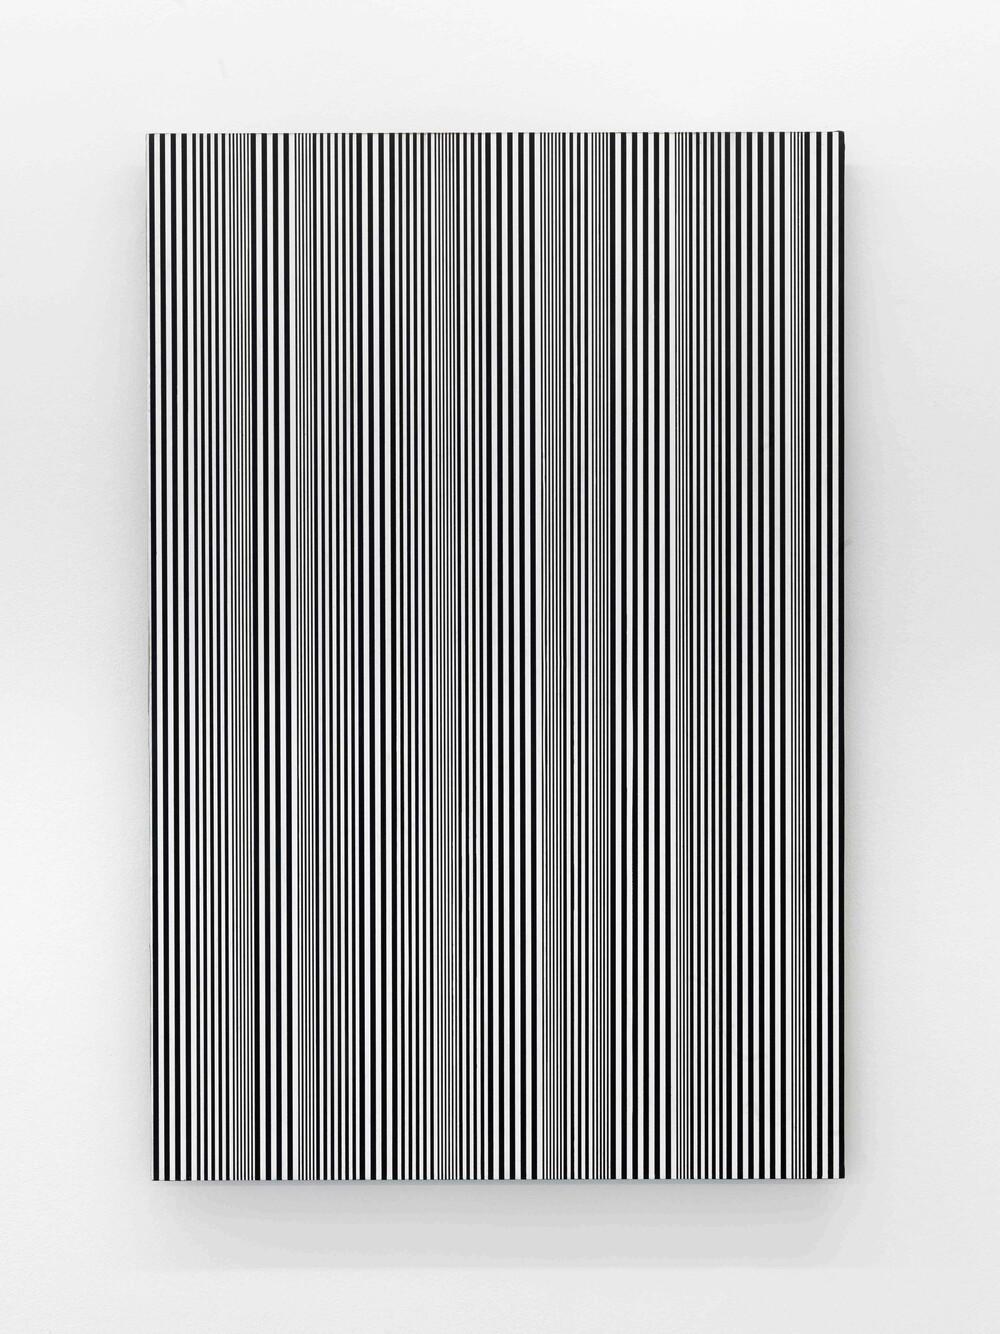 Untitled #52 - © Galerie des Galeries